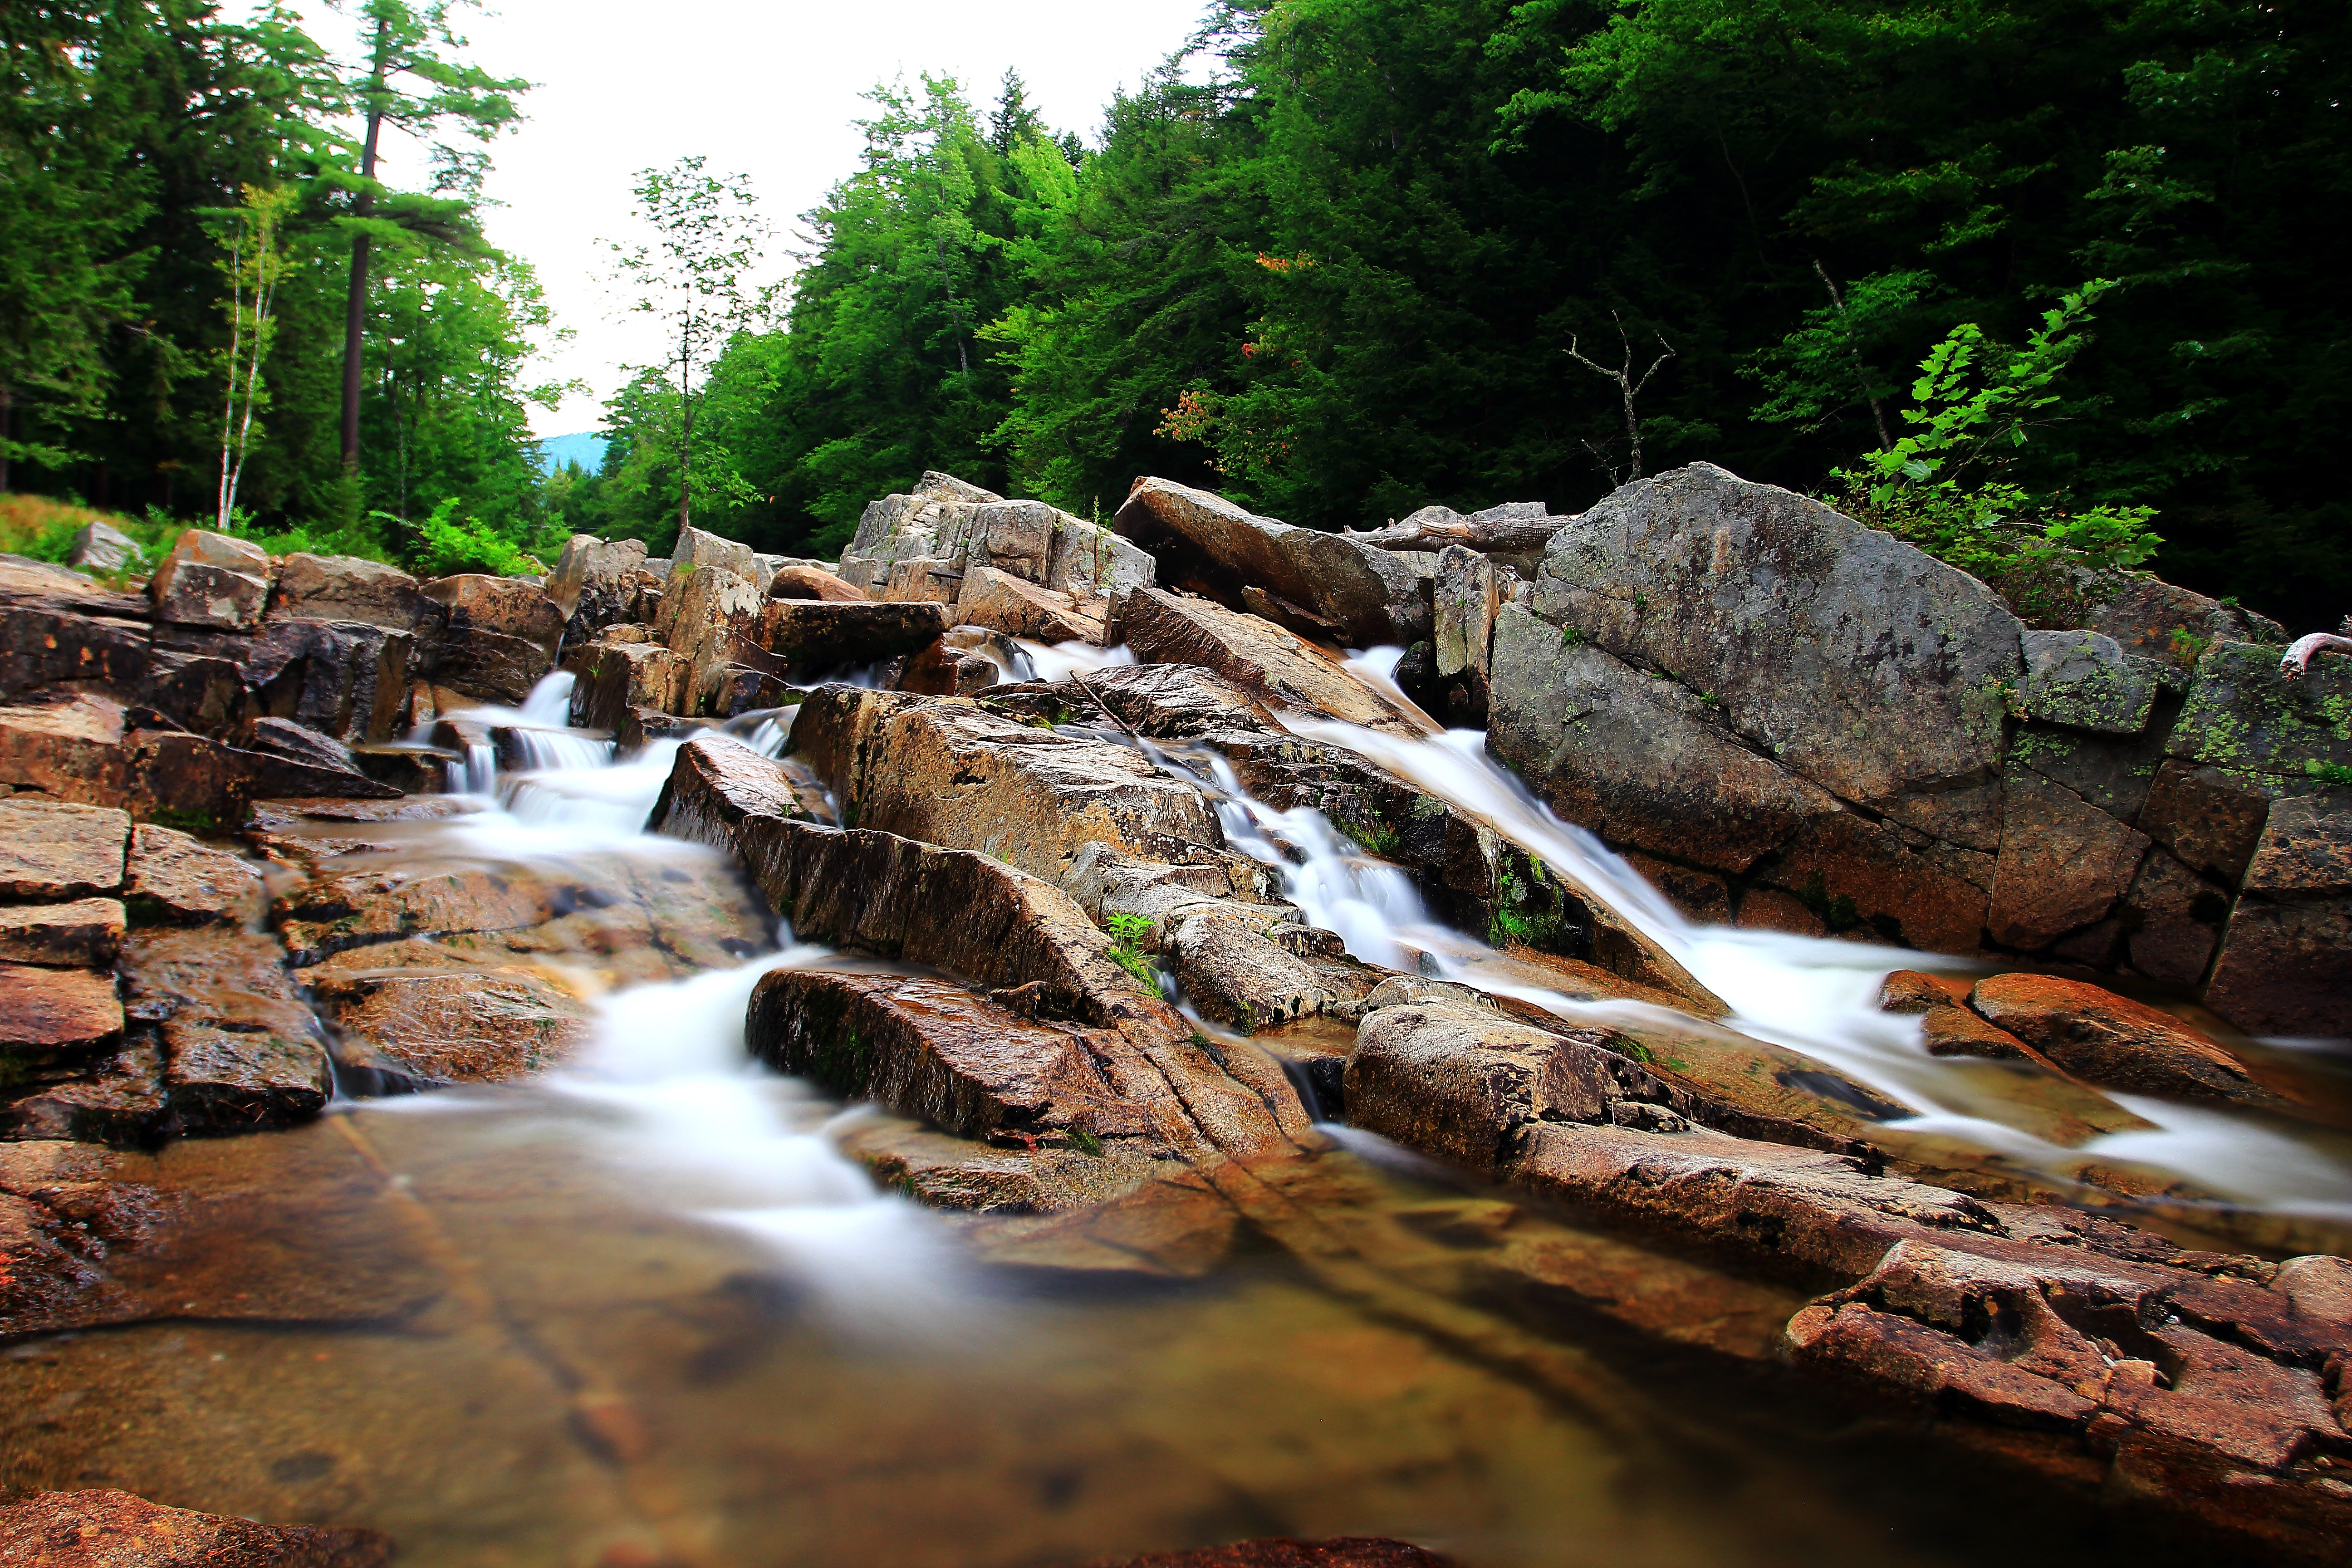 природа камни река деревья nature stones river trees бесплатно